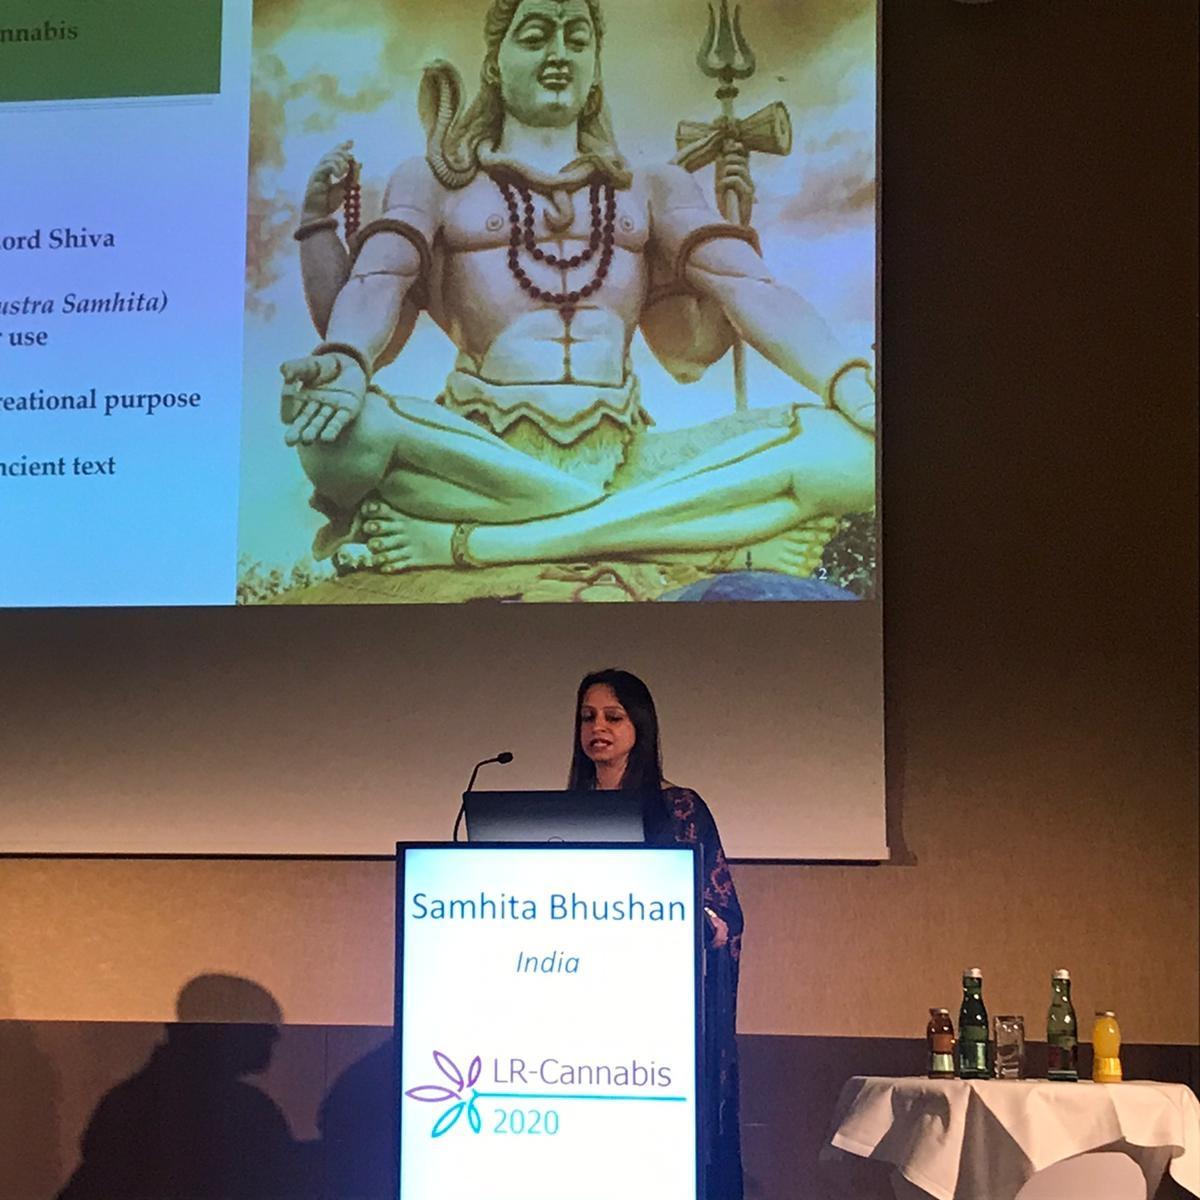 Use of cannabis needed in India: Dr Samahita Bhushan